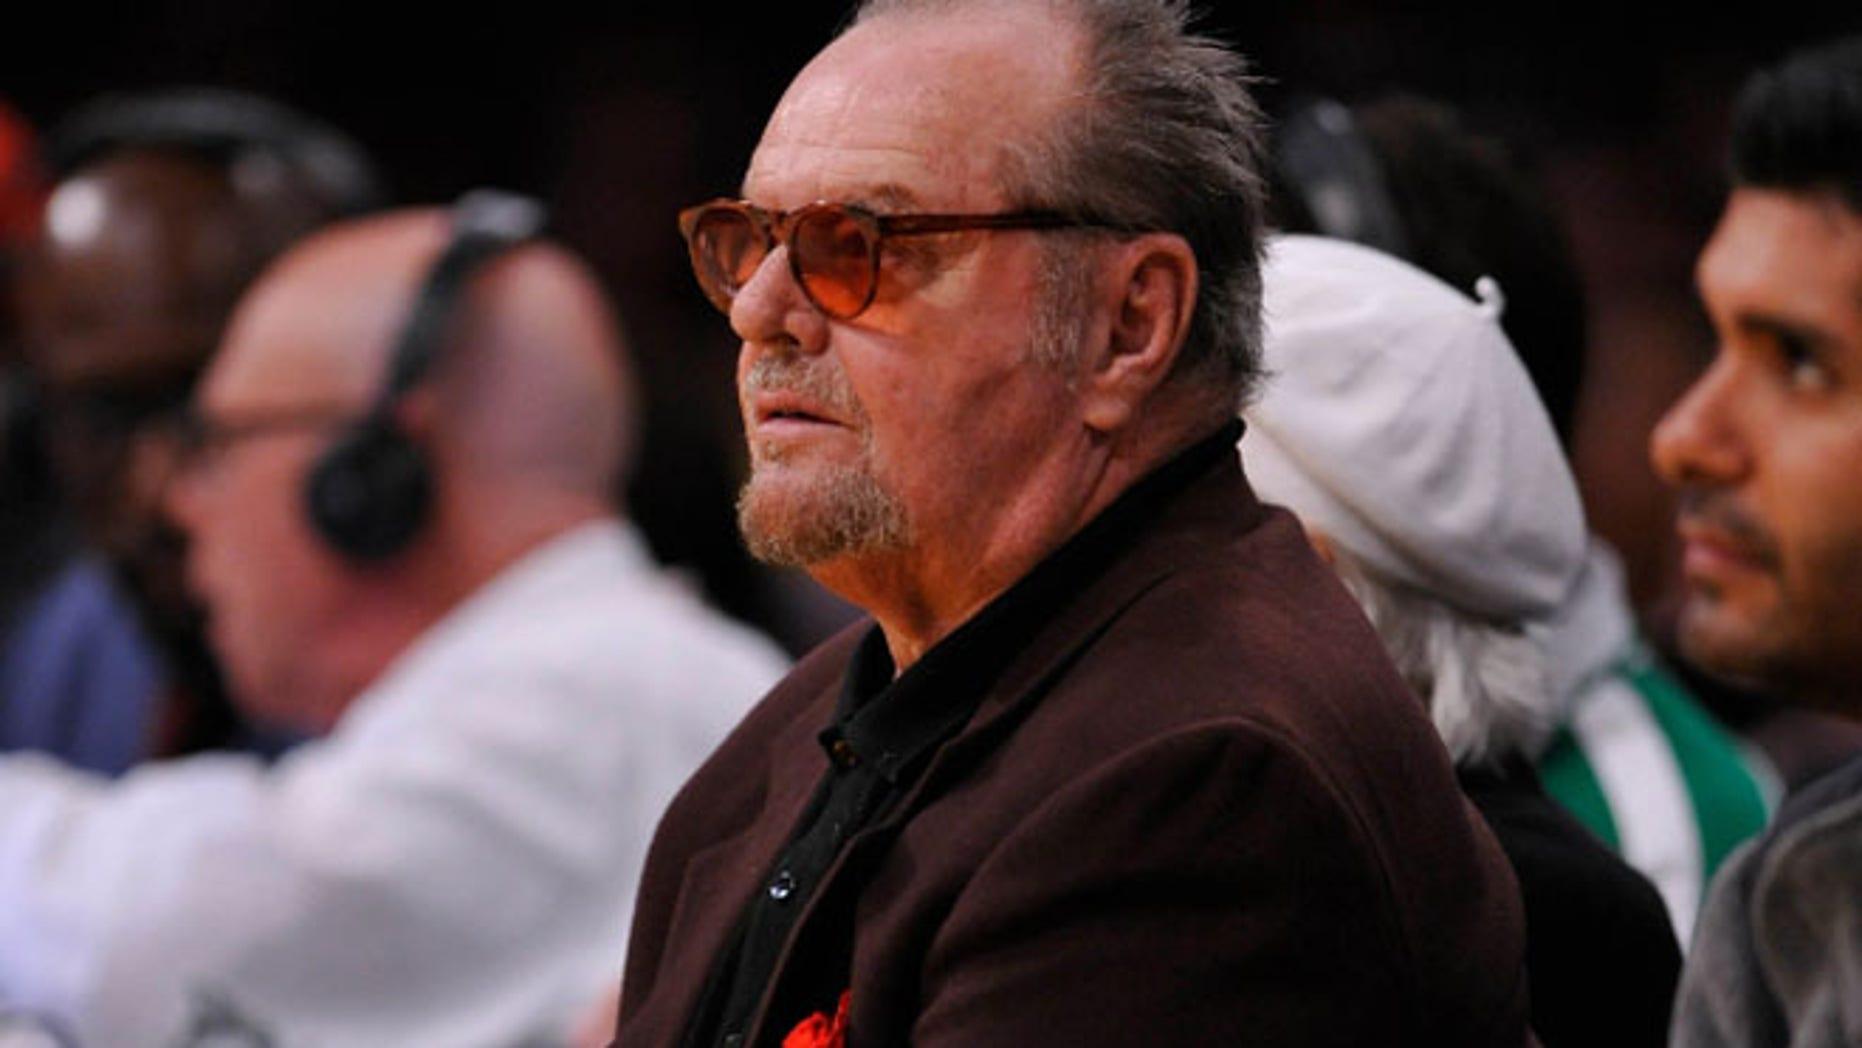 Peter Fonda says his friend Jack Nicholson has retired at 79.